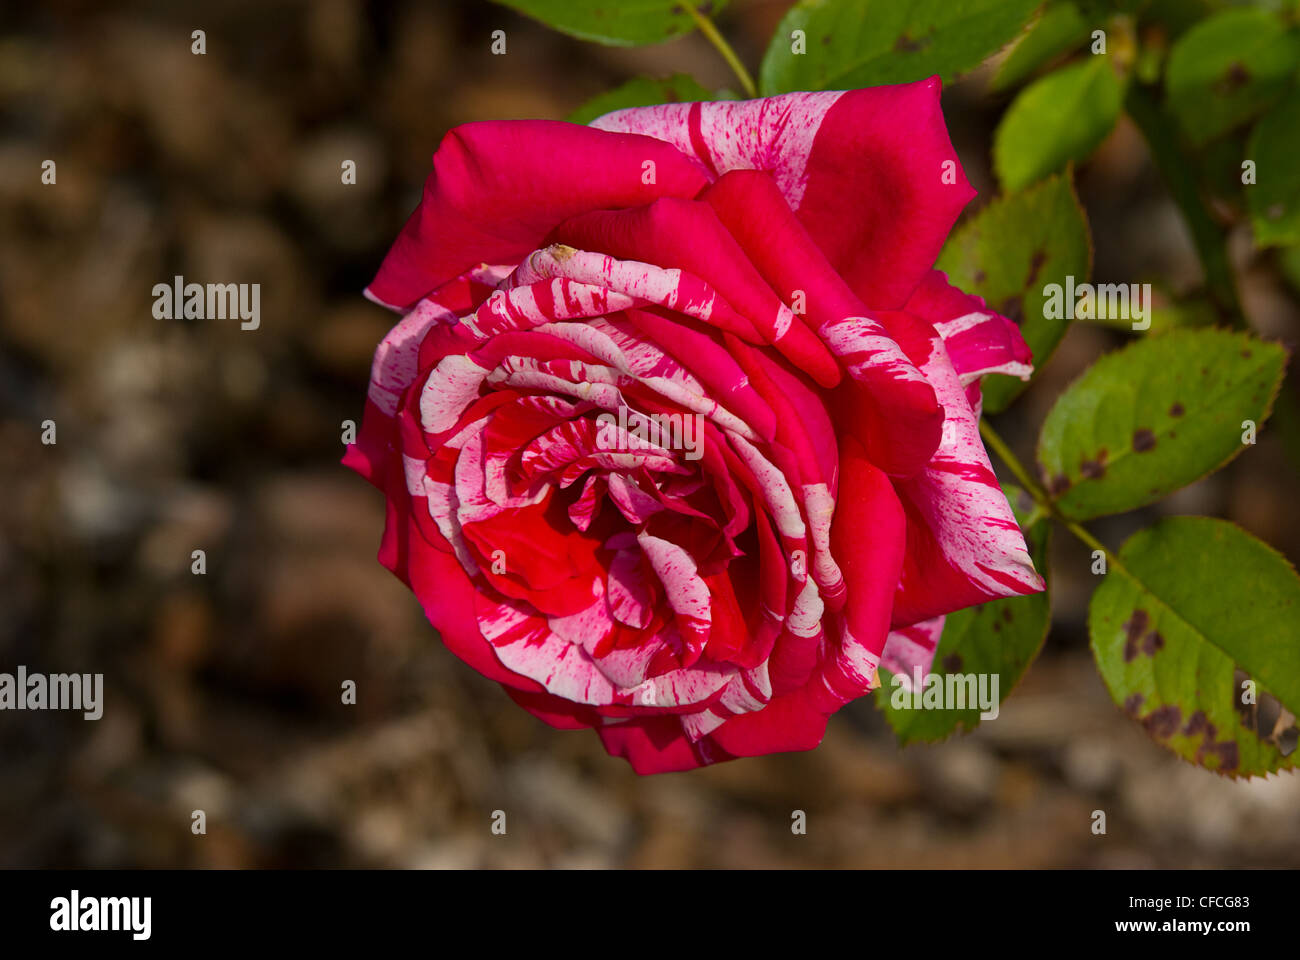 Rose Rosaceae flower nature love bloom plant close up view Journal beautiful macro closeup plant plant part - Stock Image